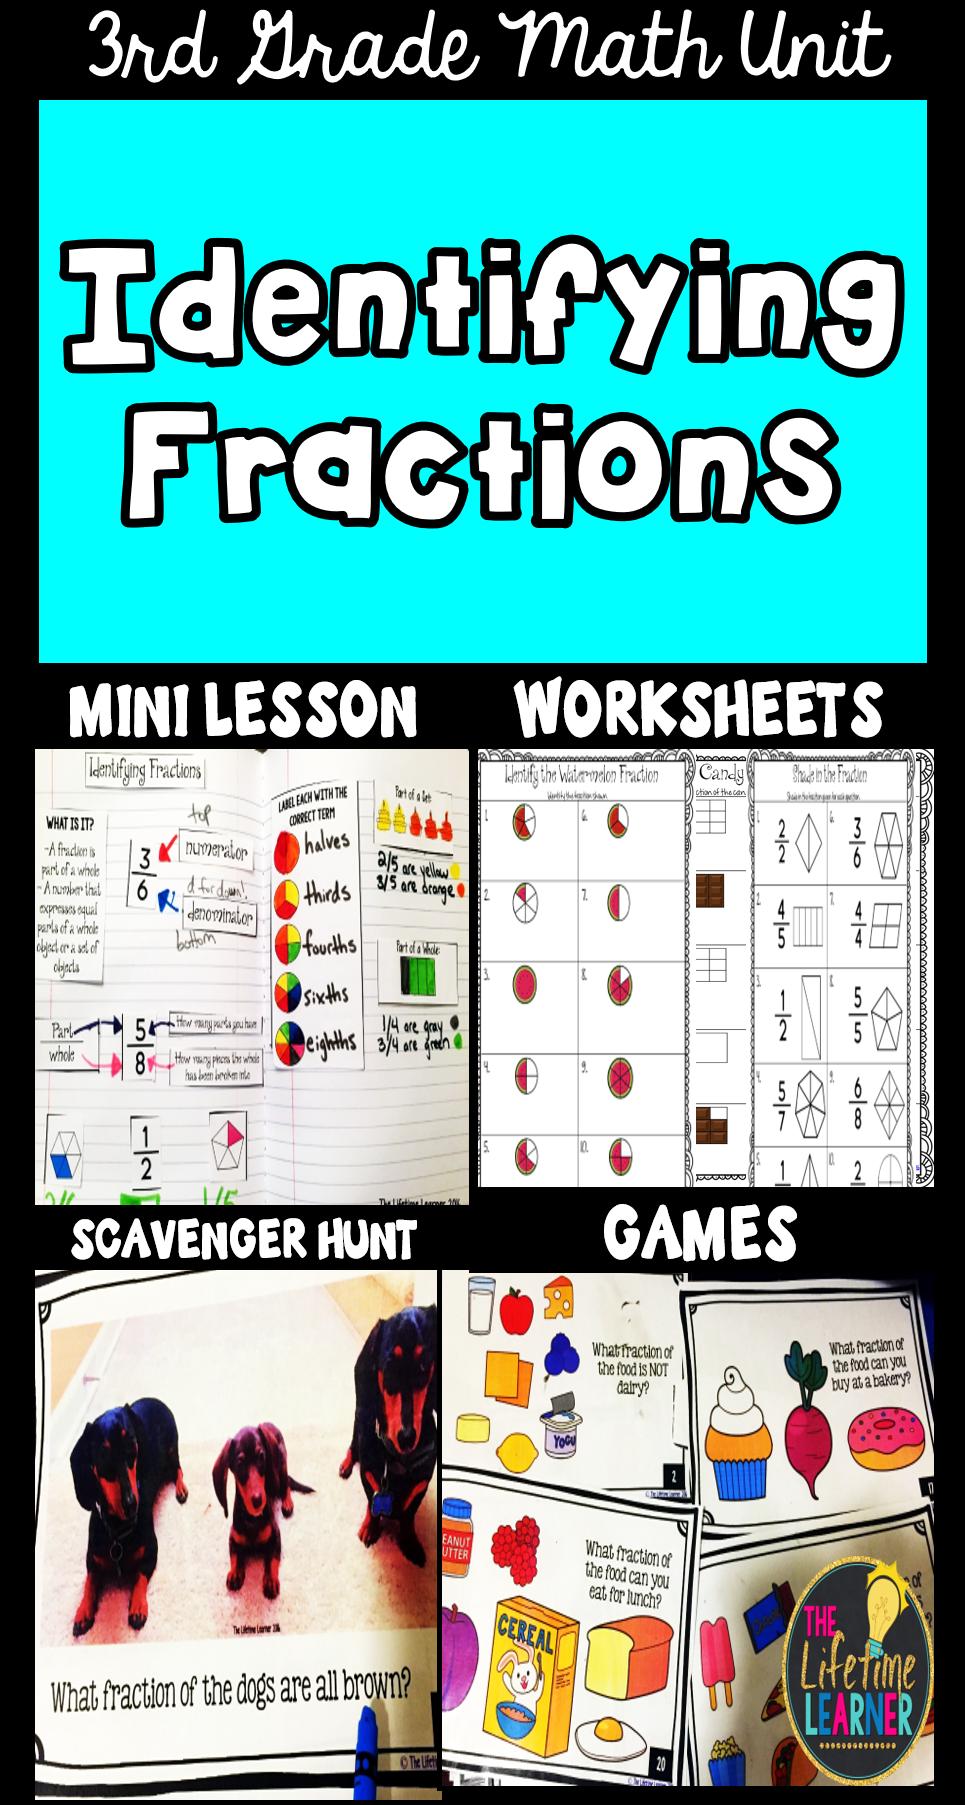 Identifying Fractions - Fraction Worksheets Activities Games | Pinterest